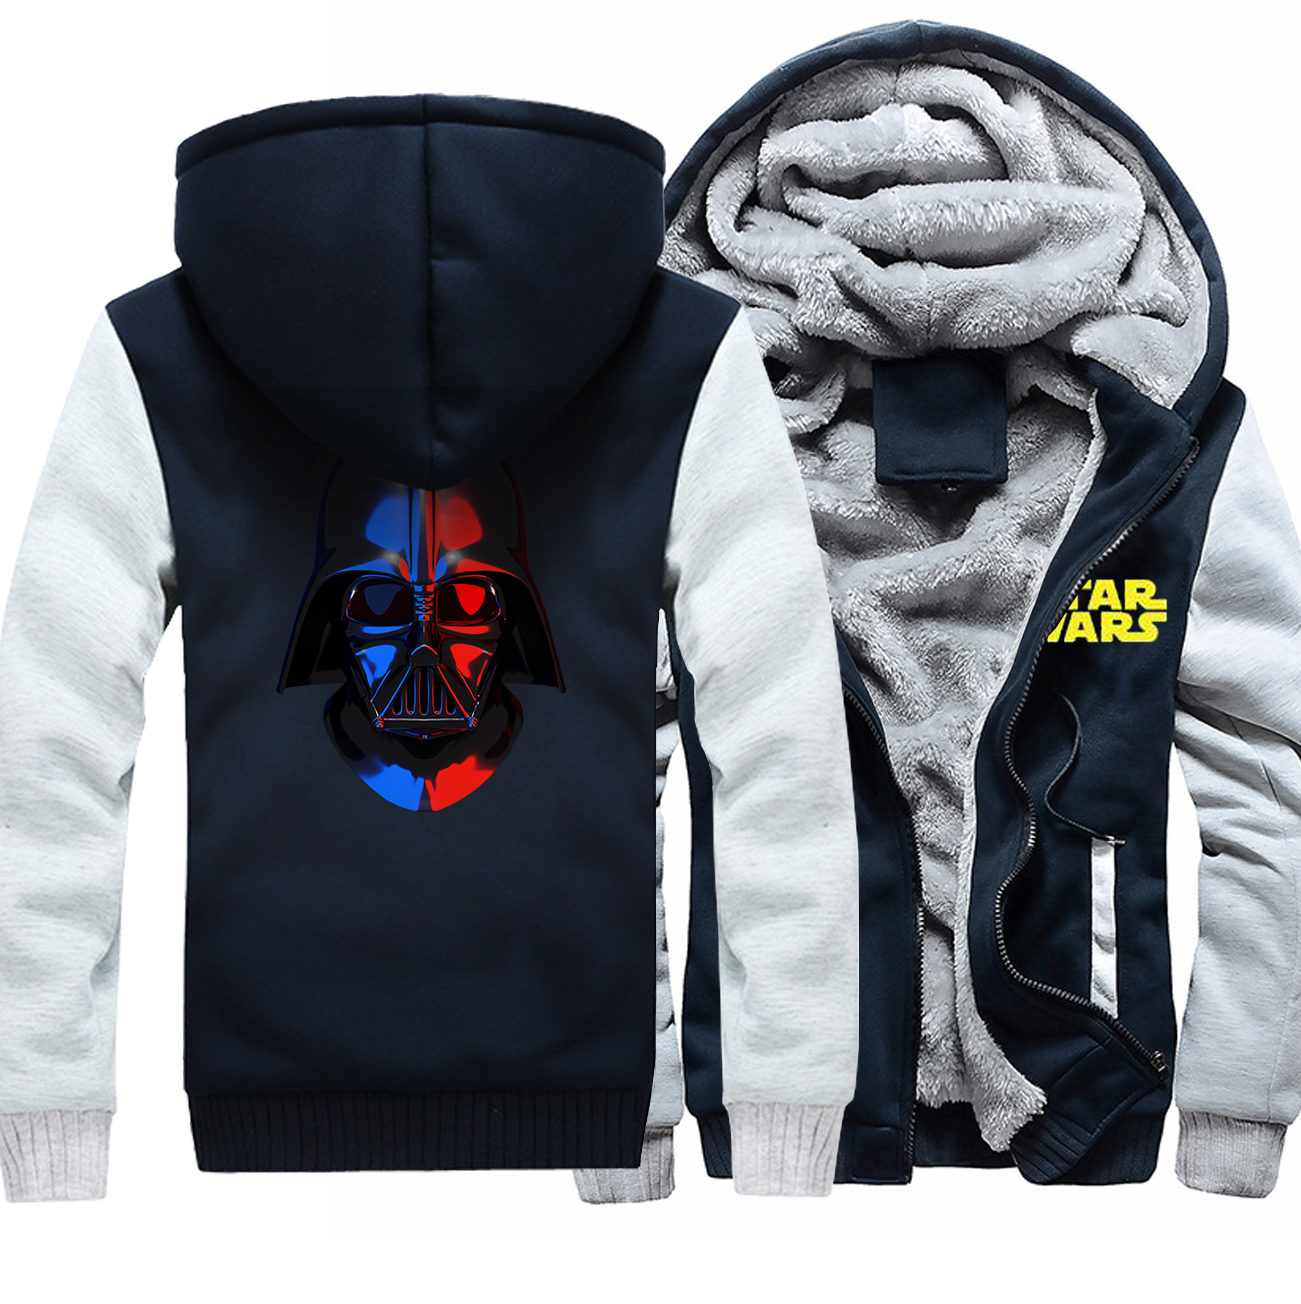 The Avengers Anime Hoodies For Men 2018 Winter Thick Zipper Raglan Jacket Cosplay Coat Star Wars Printed Sweatshirt Hot Sale Top